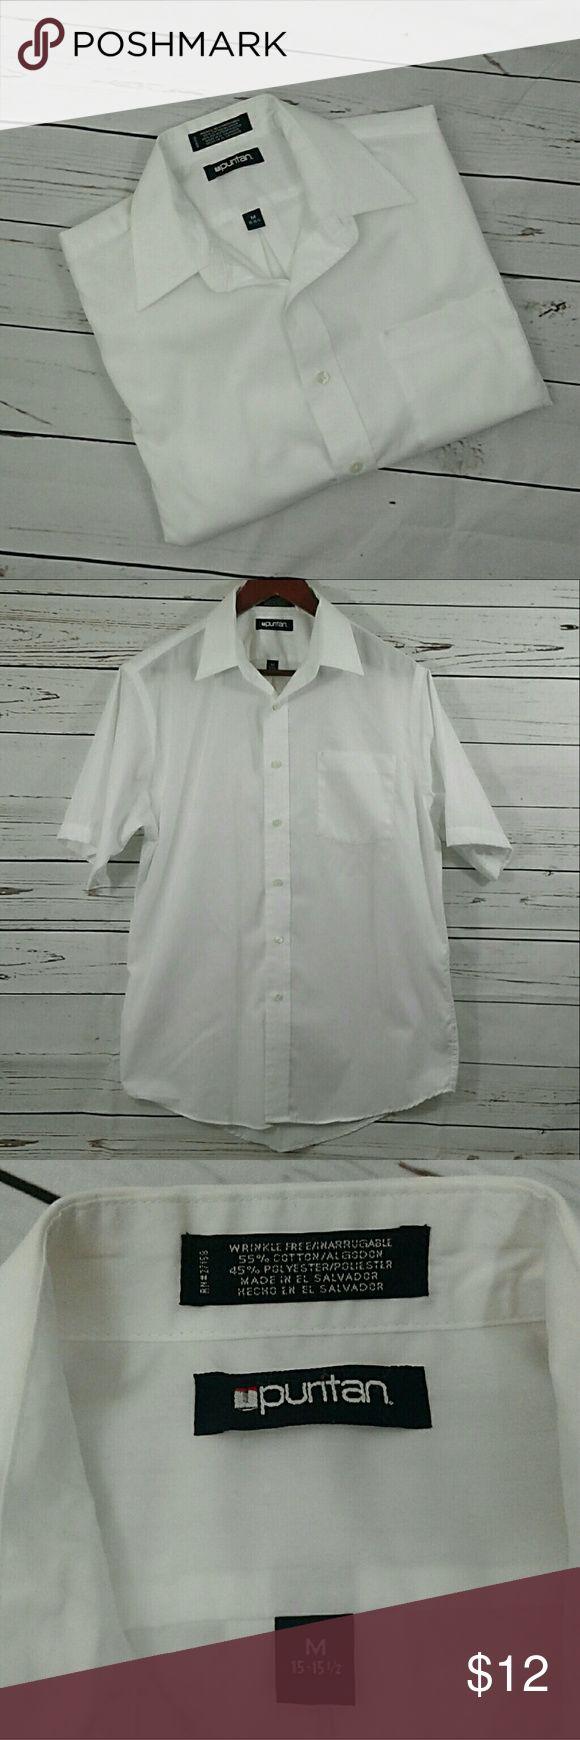 Puritan white short sleeve dress shirt Sz M 15- 15 1/2 1 left pocket , short sleeves, button up, wrinkle free Puritan Shirts Dress Shirts